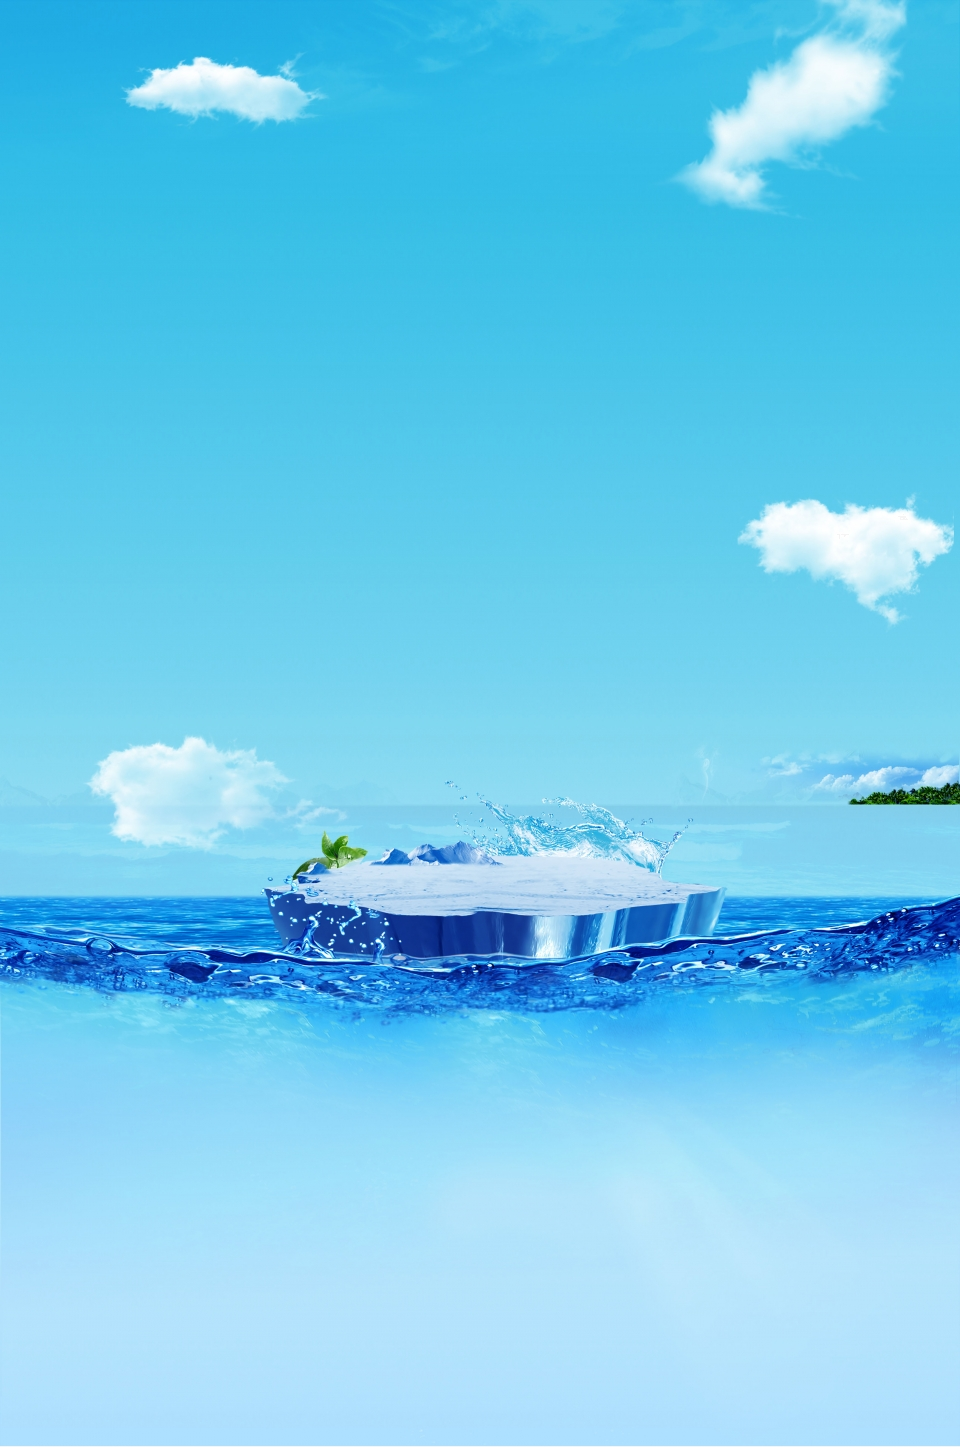 Langit Biru Es Laut Gunung Es Es Sejuk Bahan Latar Musim Panas, Langit Biru,  Permukaan Laut, Es Batu Gambar Latar Belakang Untuk Unduhan Gratis